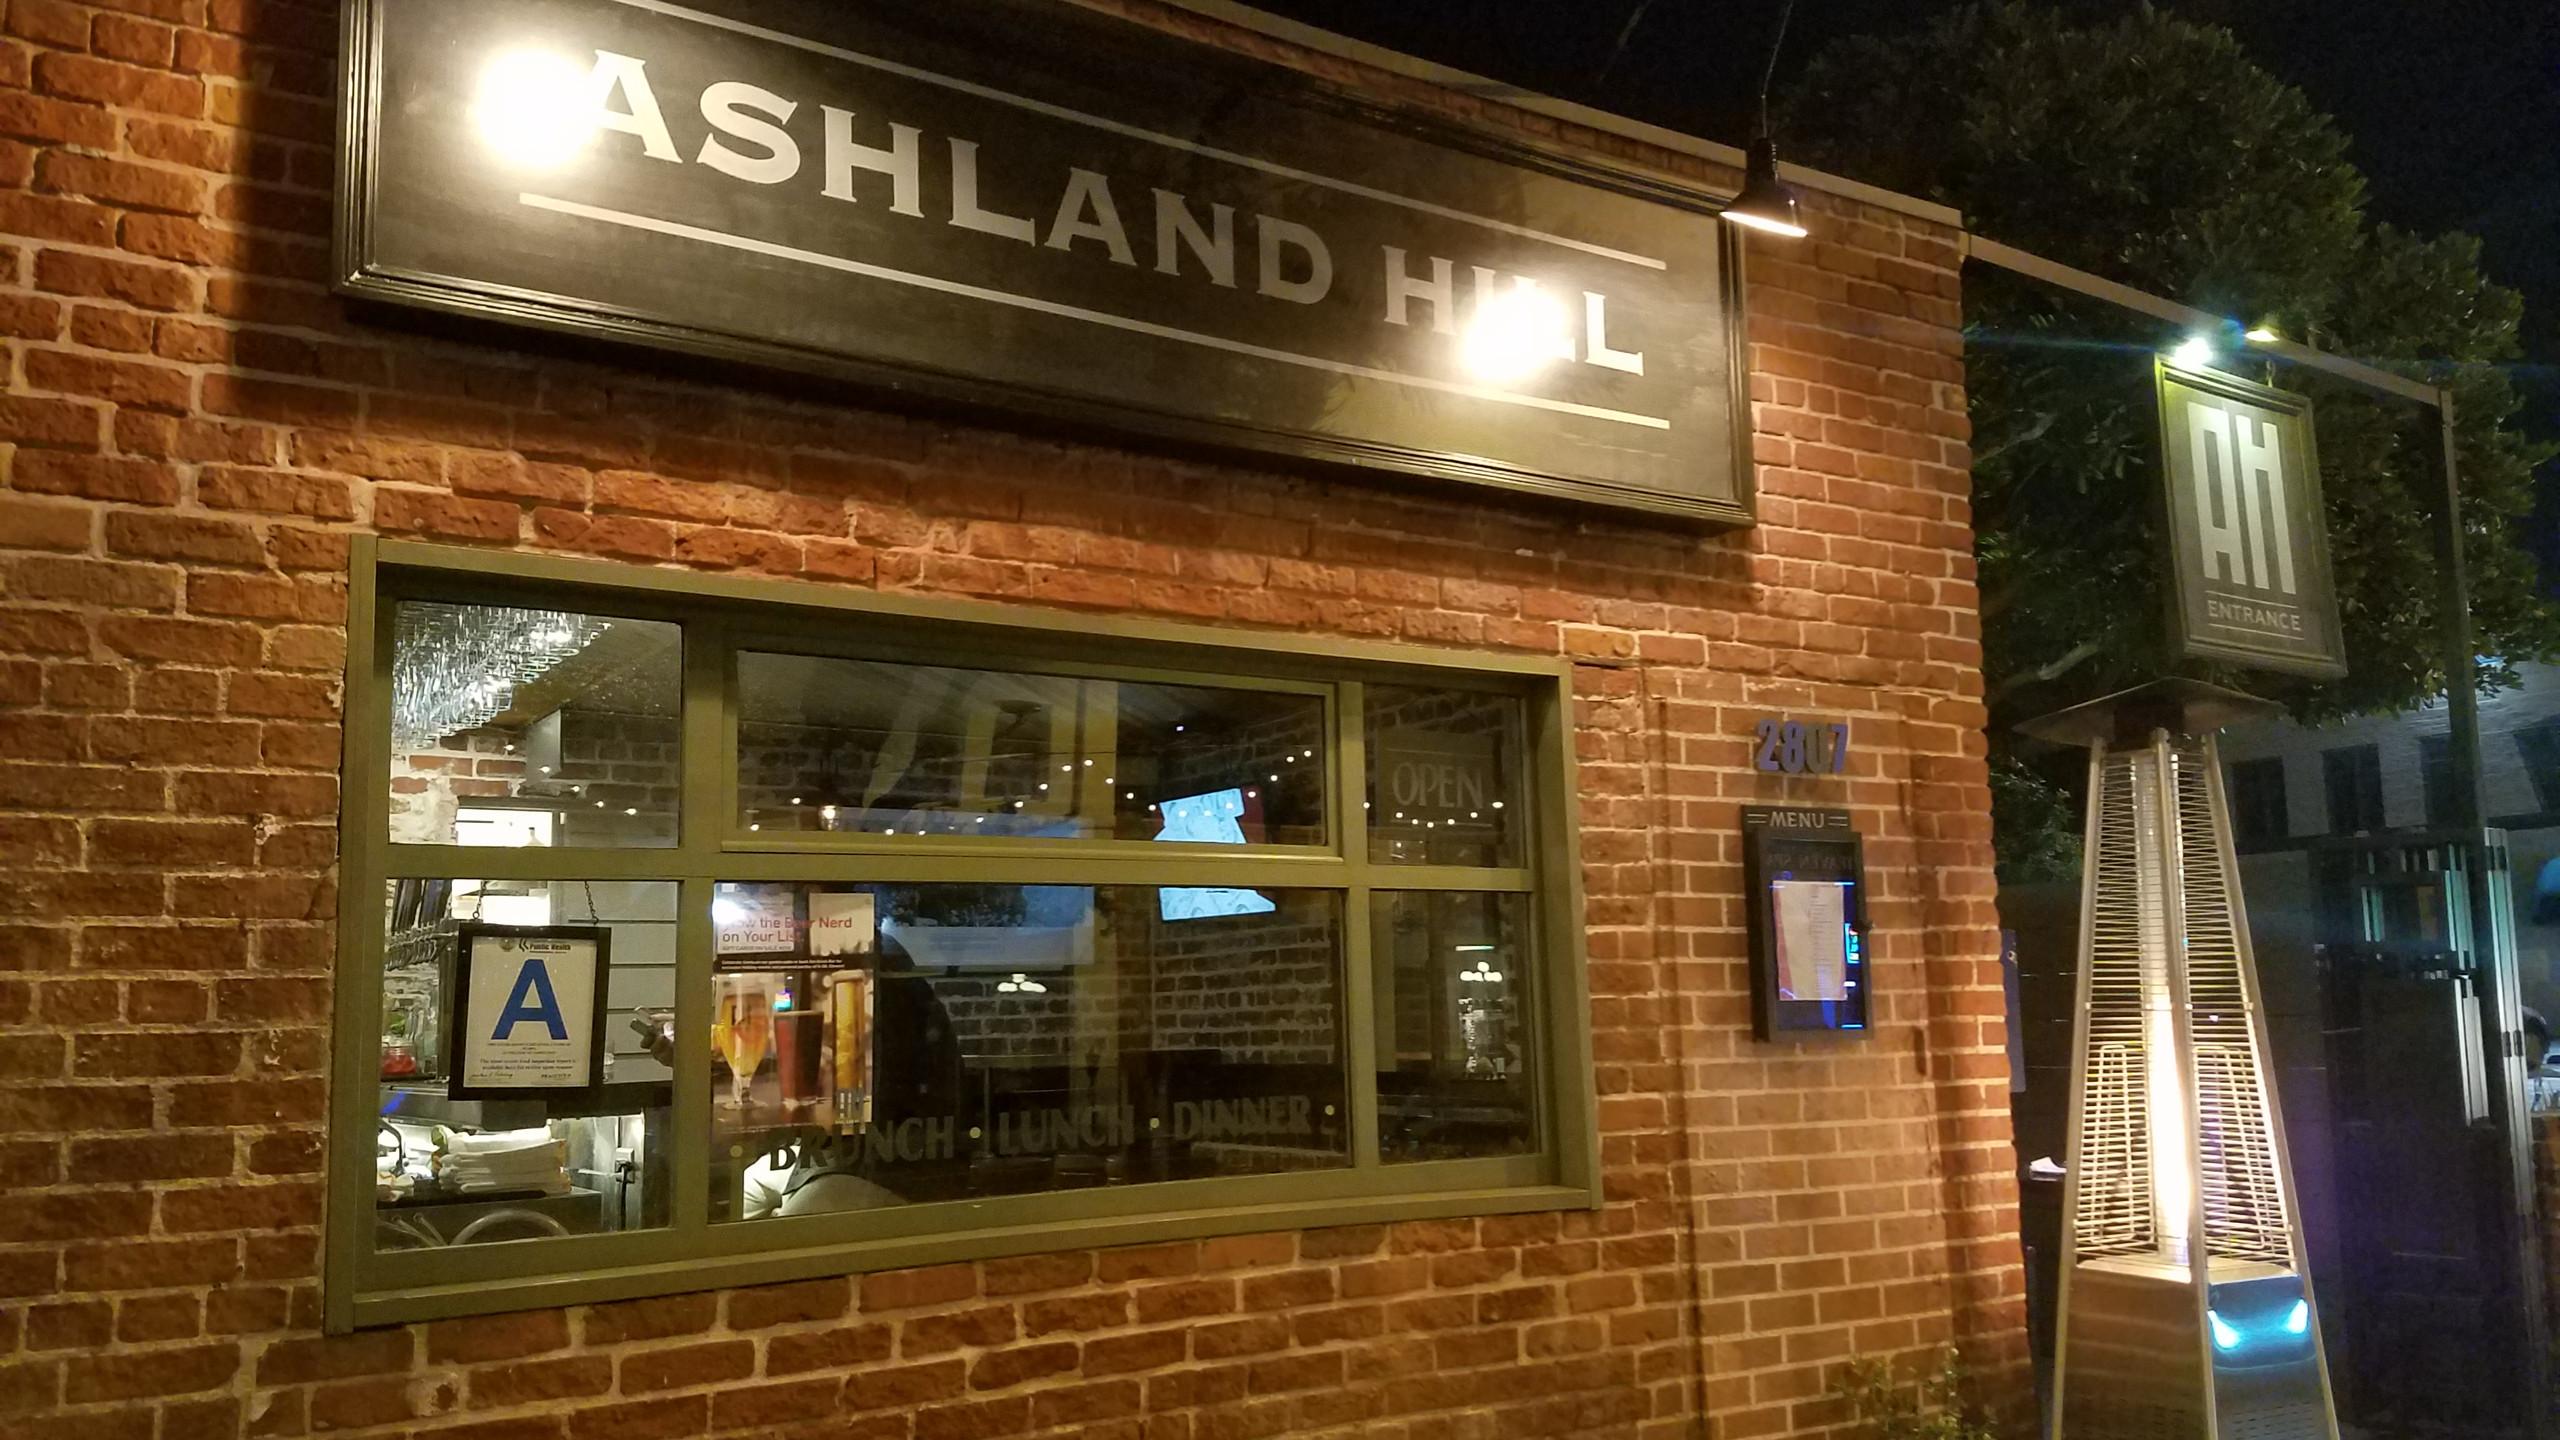 Ashland Hill